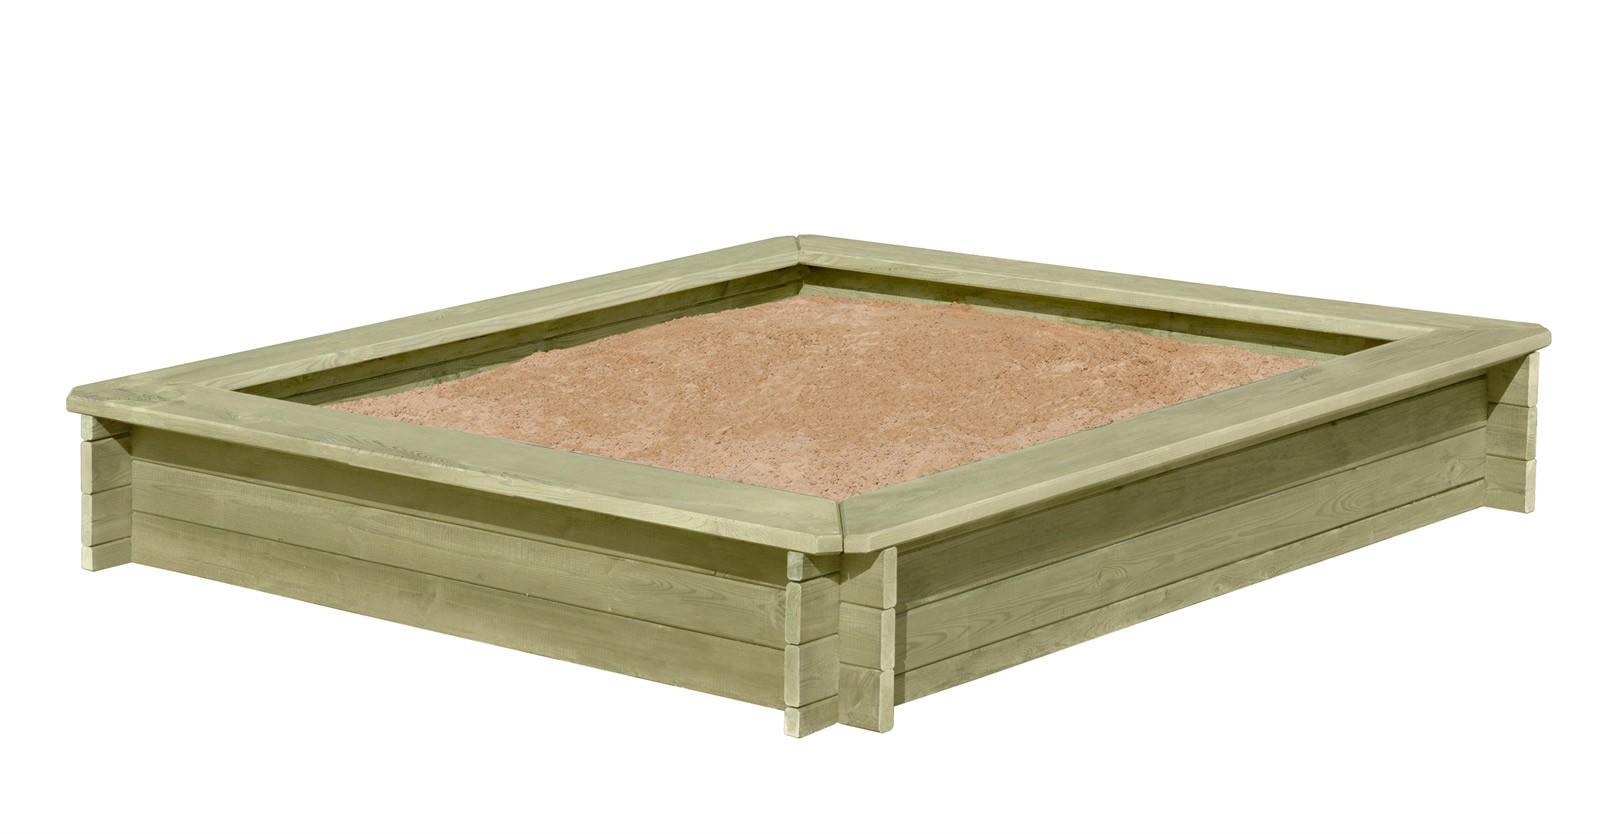 Sandkasten Stabil 180x180x30cm Bild 1